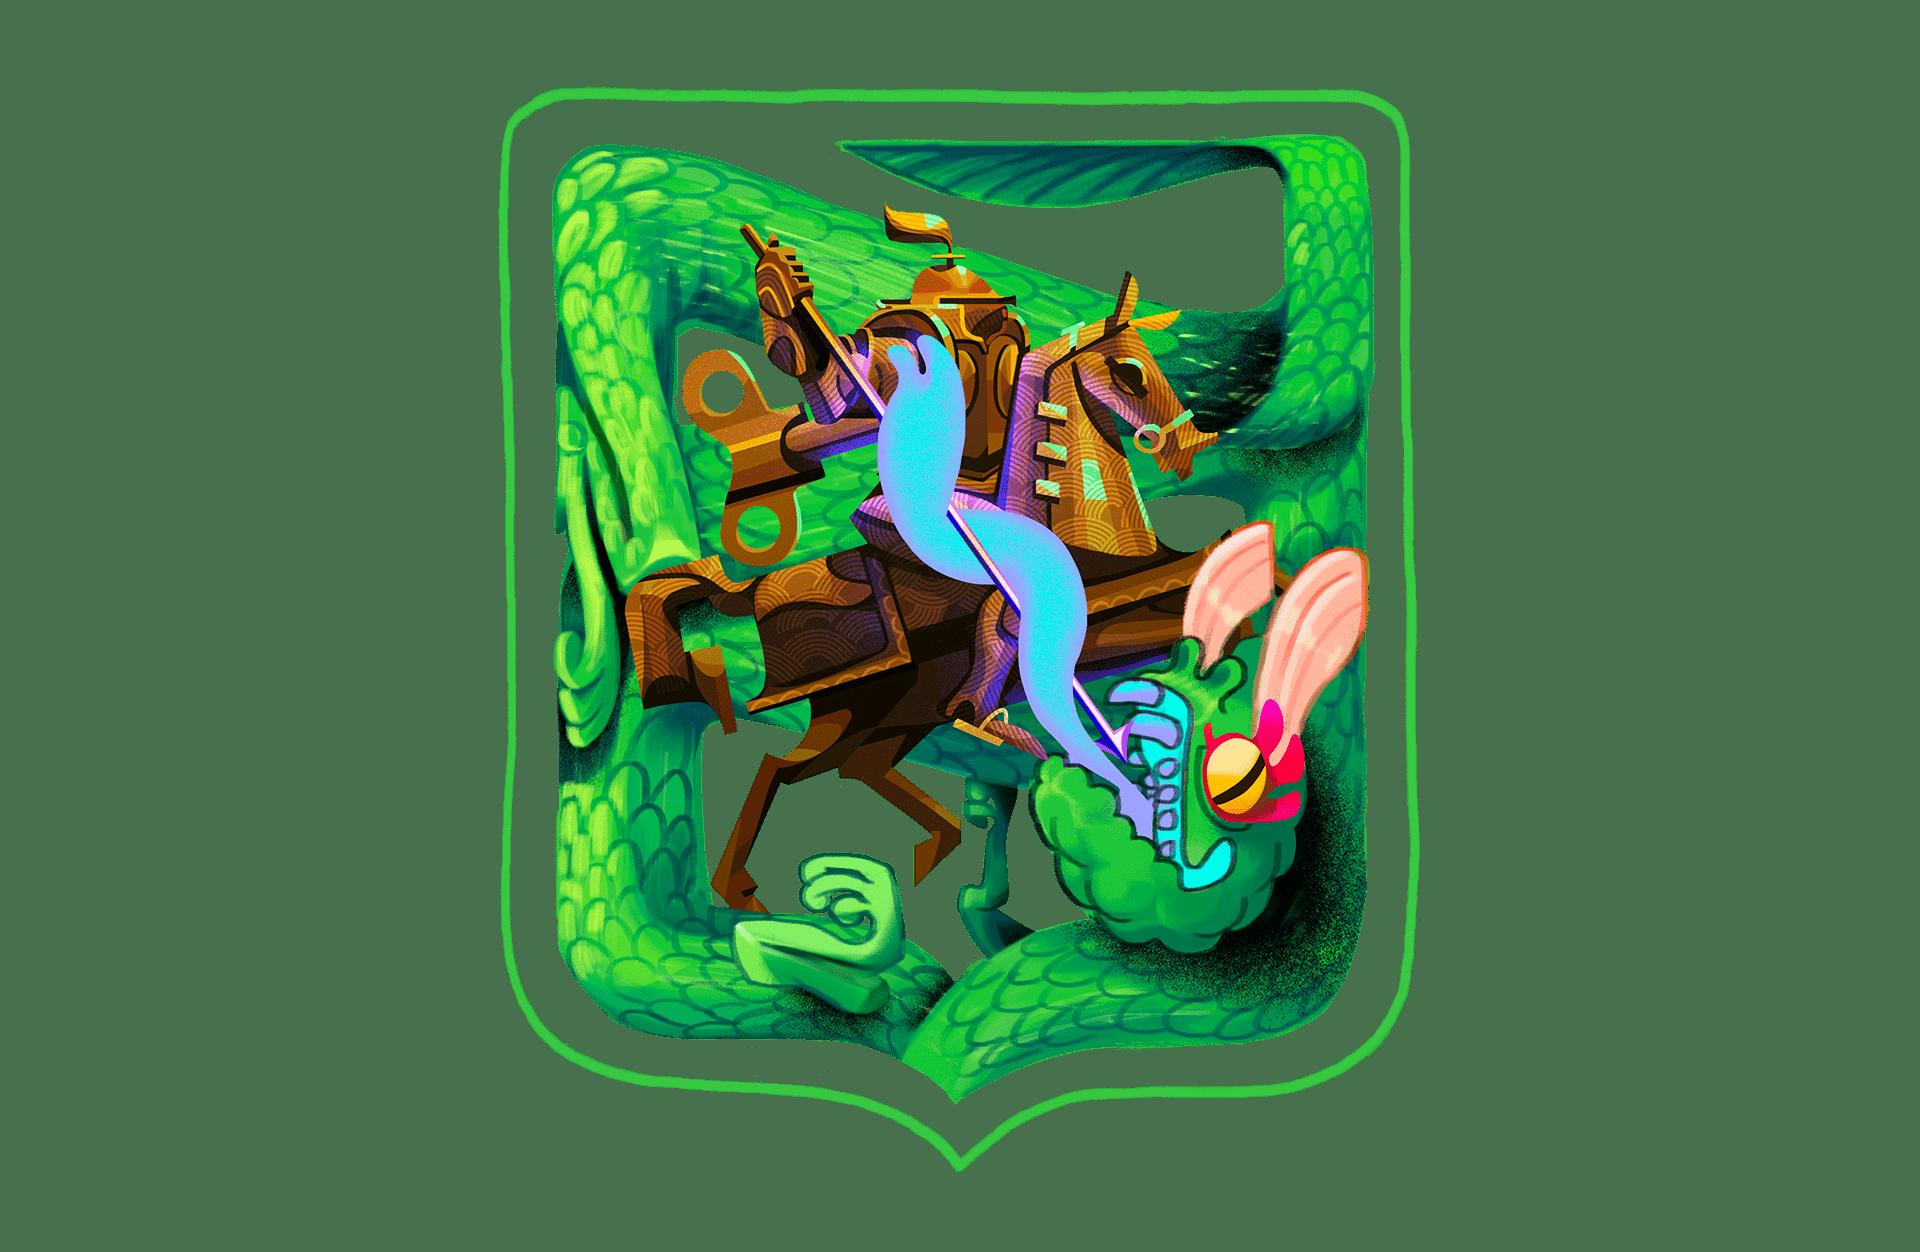 15 - Новый герб Москвы